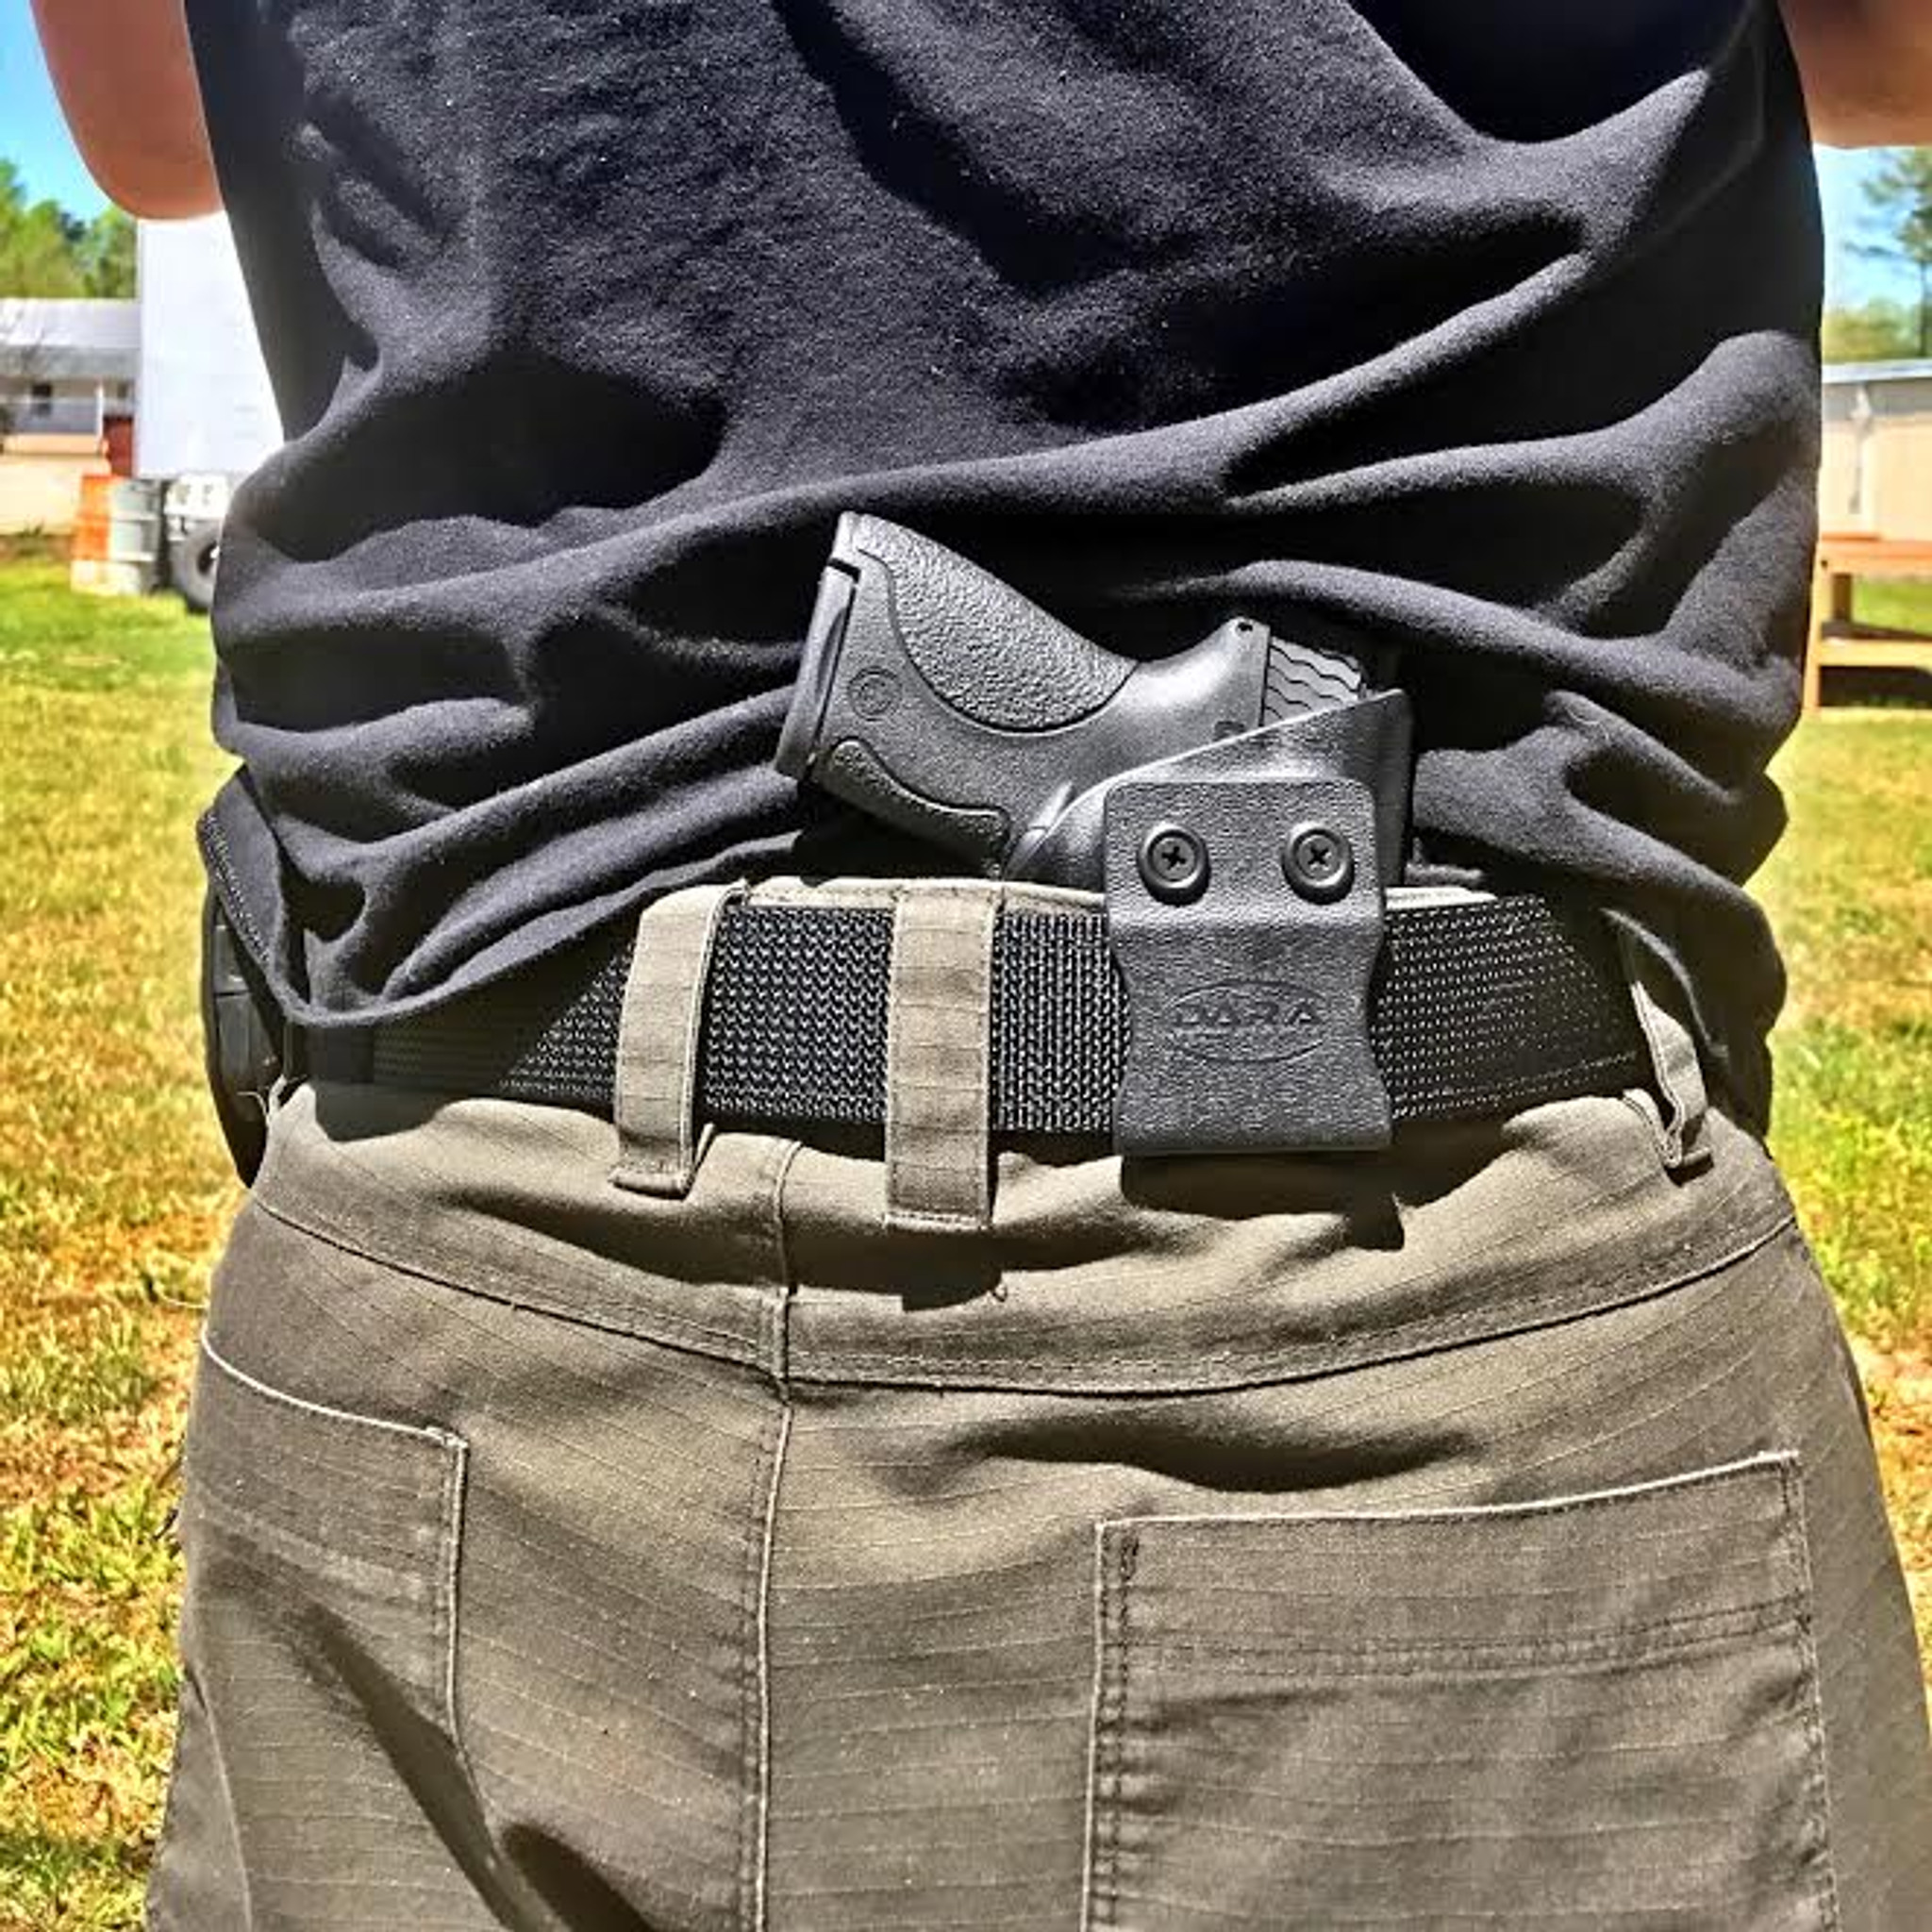 M&P Shield IWB Holster & Nylon Tacbelt